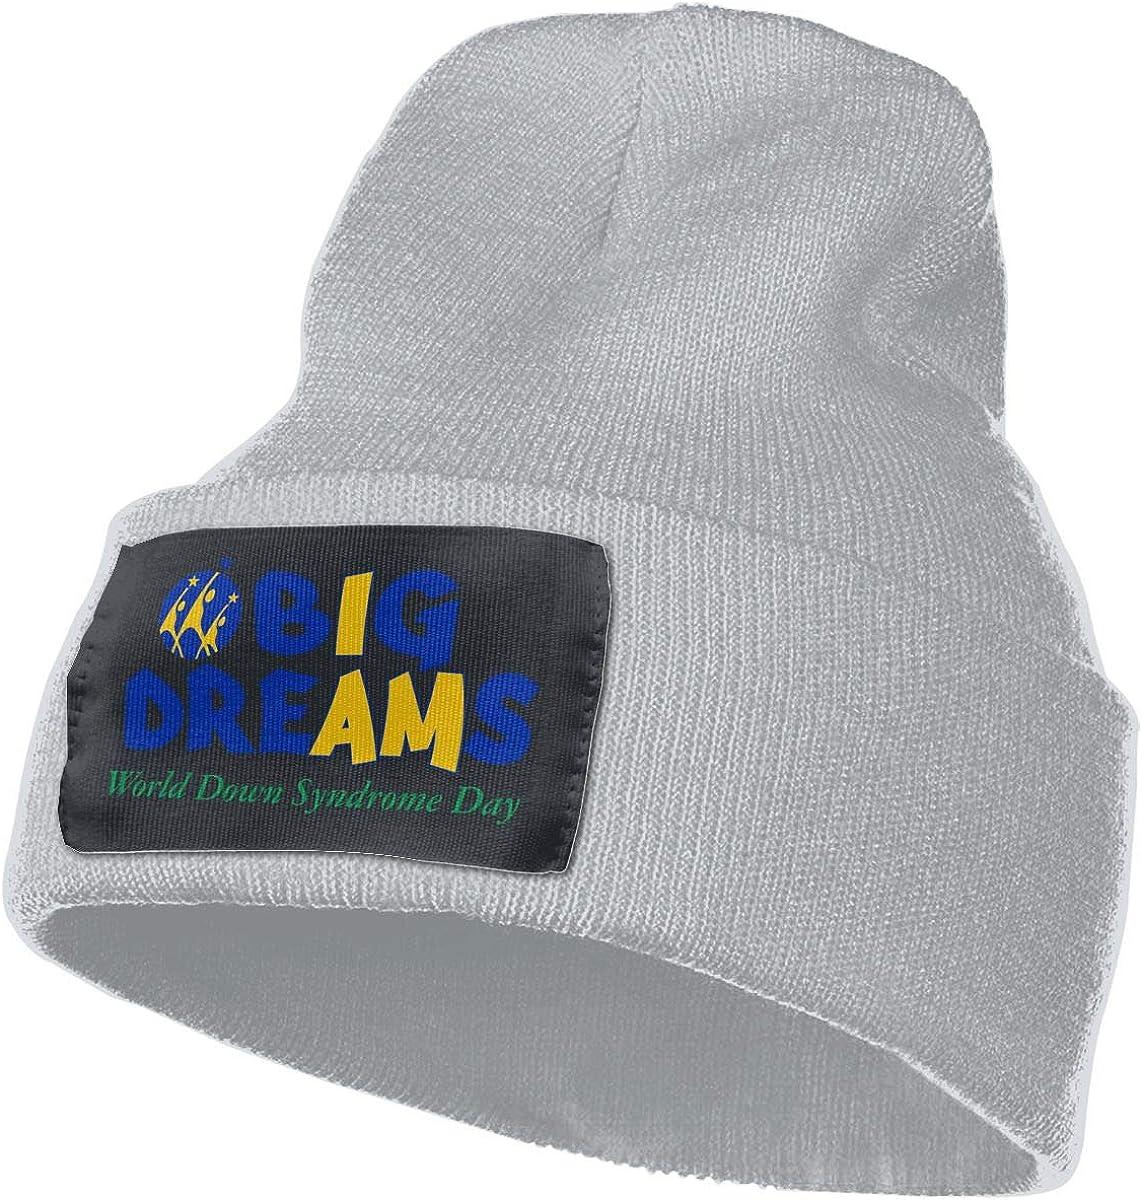 AgnWad Unisex World Down Syndrome Day Knit Cap Soft Stretch Knit Hat Cap Winter Warmer Knit Cap Winter Warm Knitting Hats